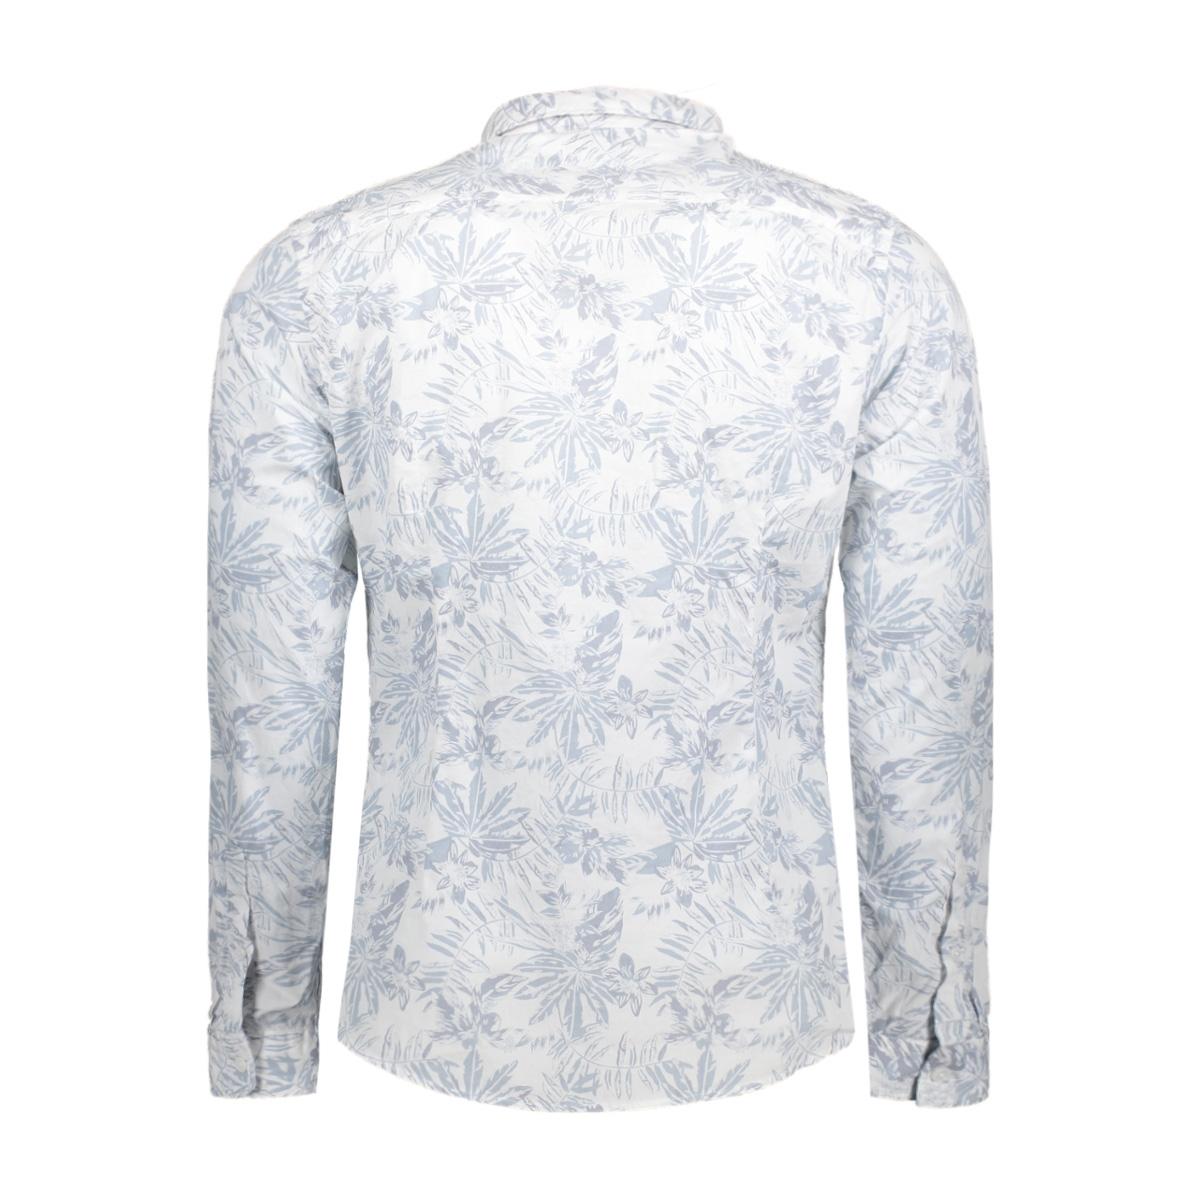 077ee2f022 esprit overhemd e100